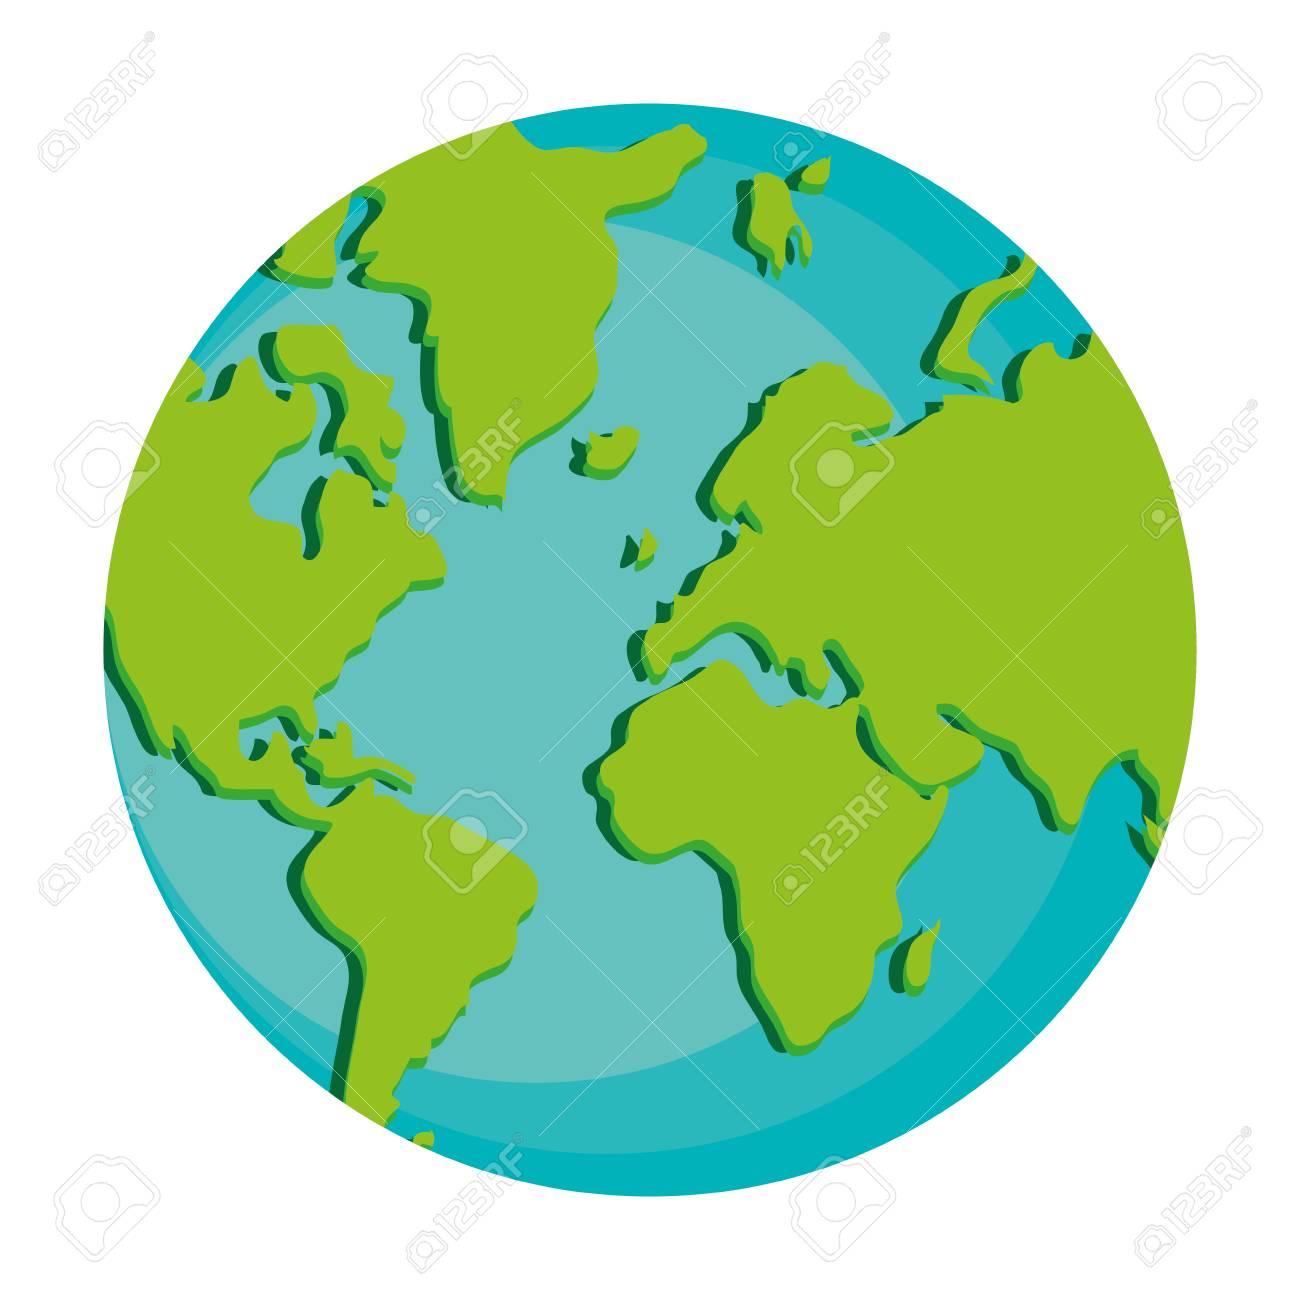 flat design earth globe icon vector illustration royalty free rh 123rf com globe vector free black and white globe vector freepik